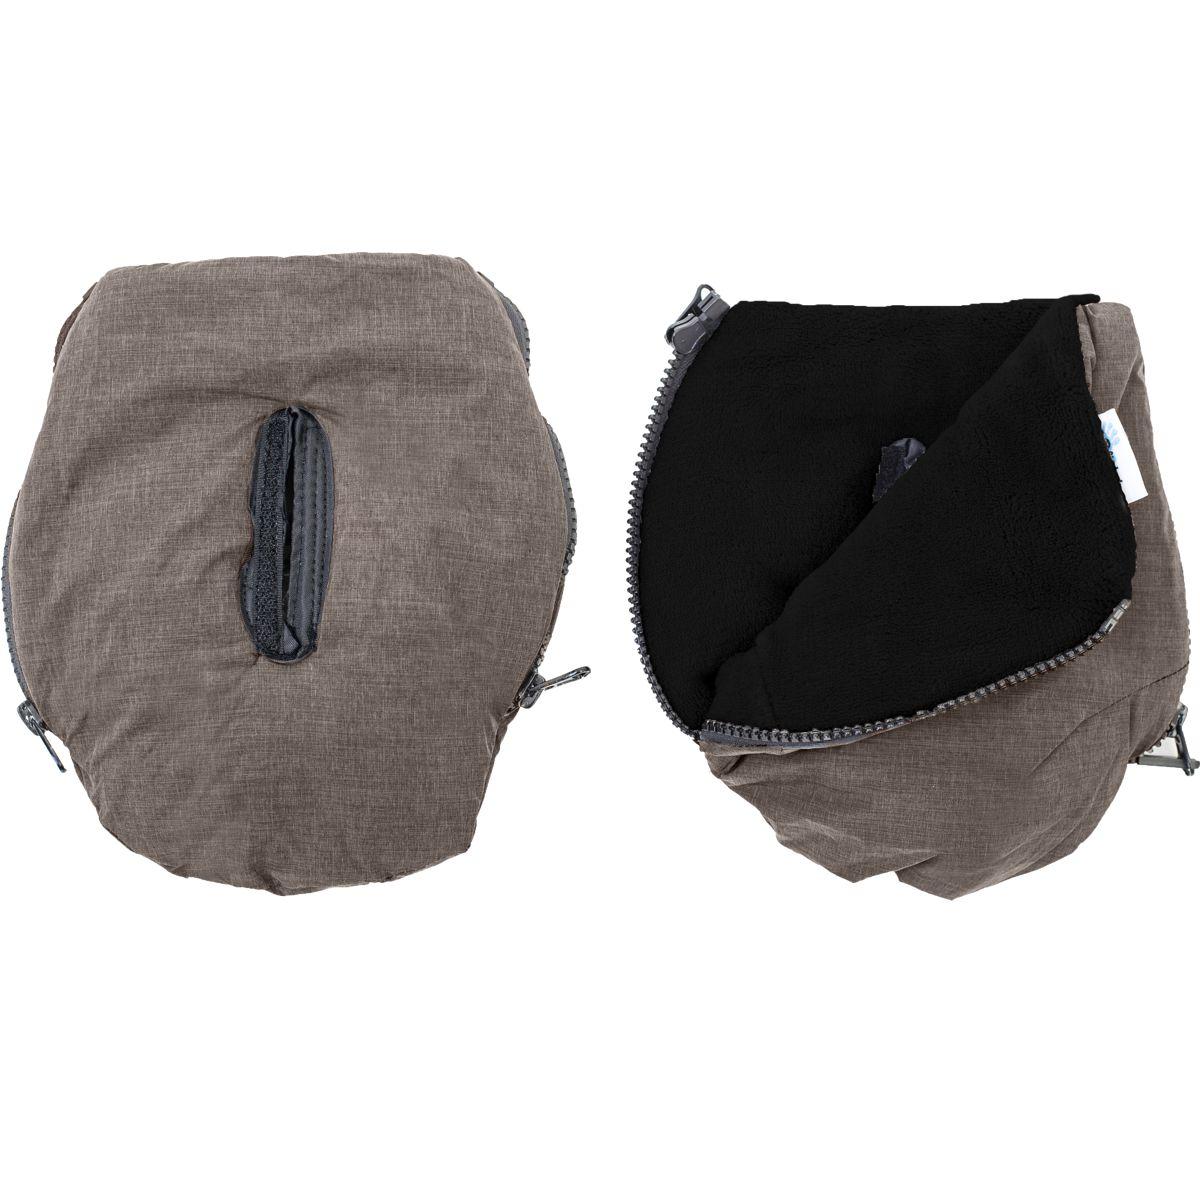 altabebe handw rmer handschuh handmuff muff f r kinderwagen buggy sportwagen ebay. Black Bedroom Furniture Sets. Home Design Ideas